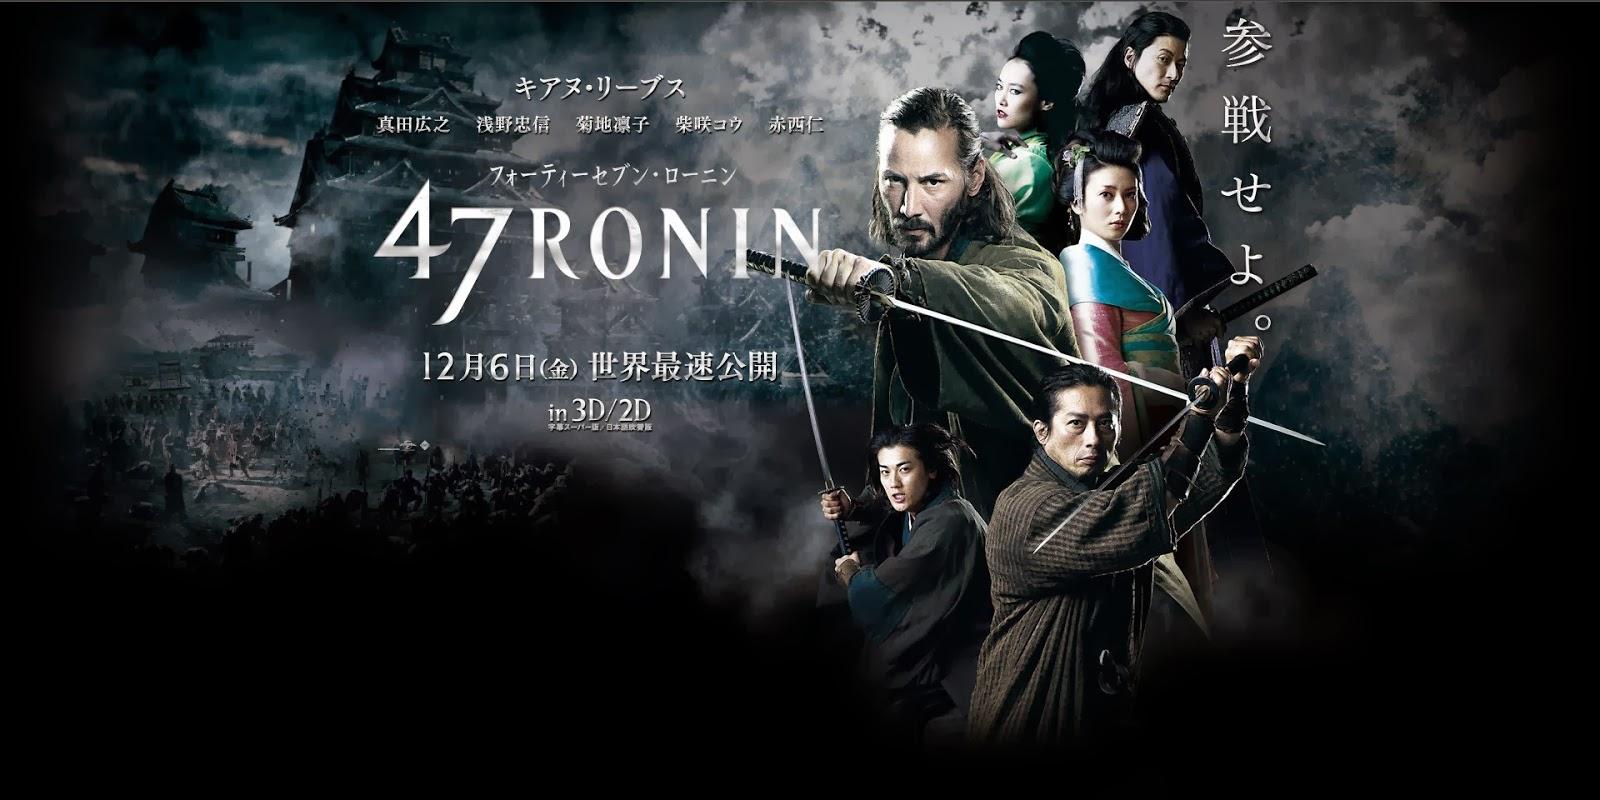 47 Ronin (2013) Hindi Dubbed Movie Watch Online 720p